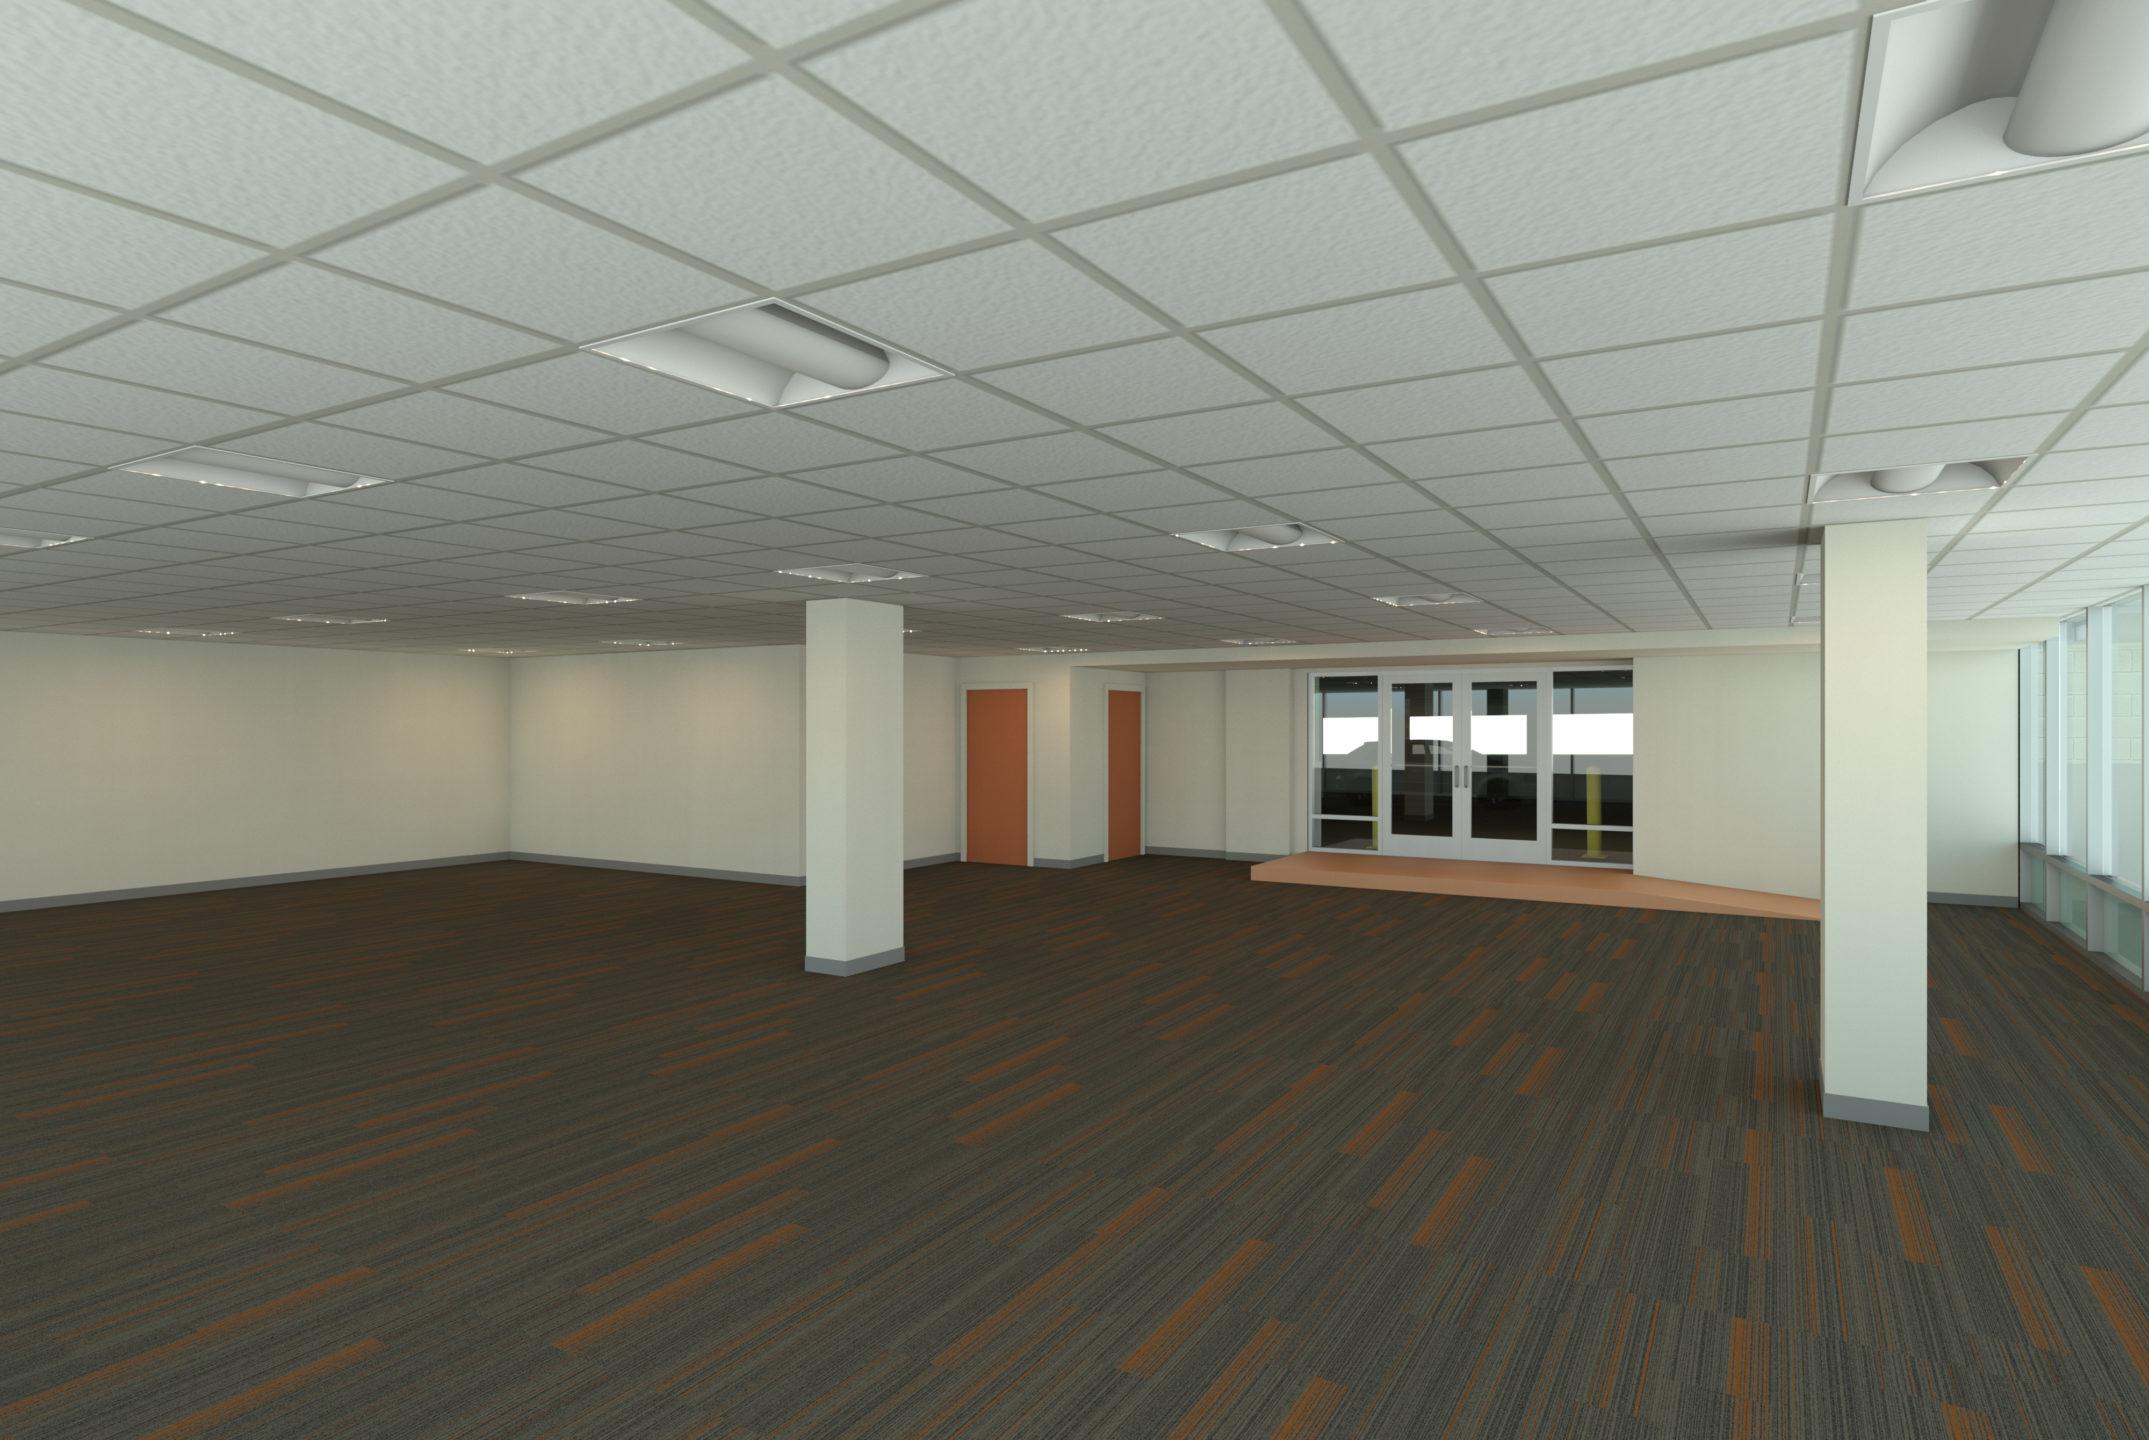 Interior after rendering